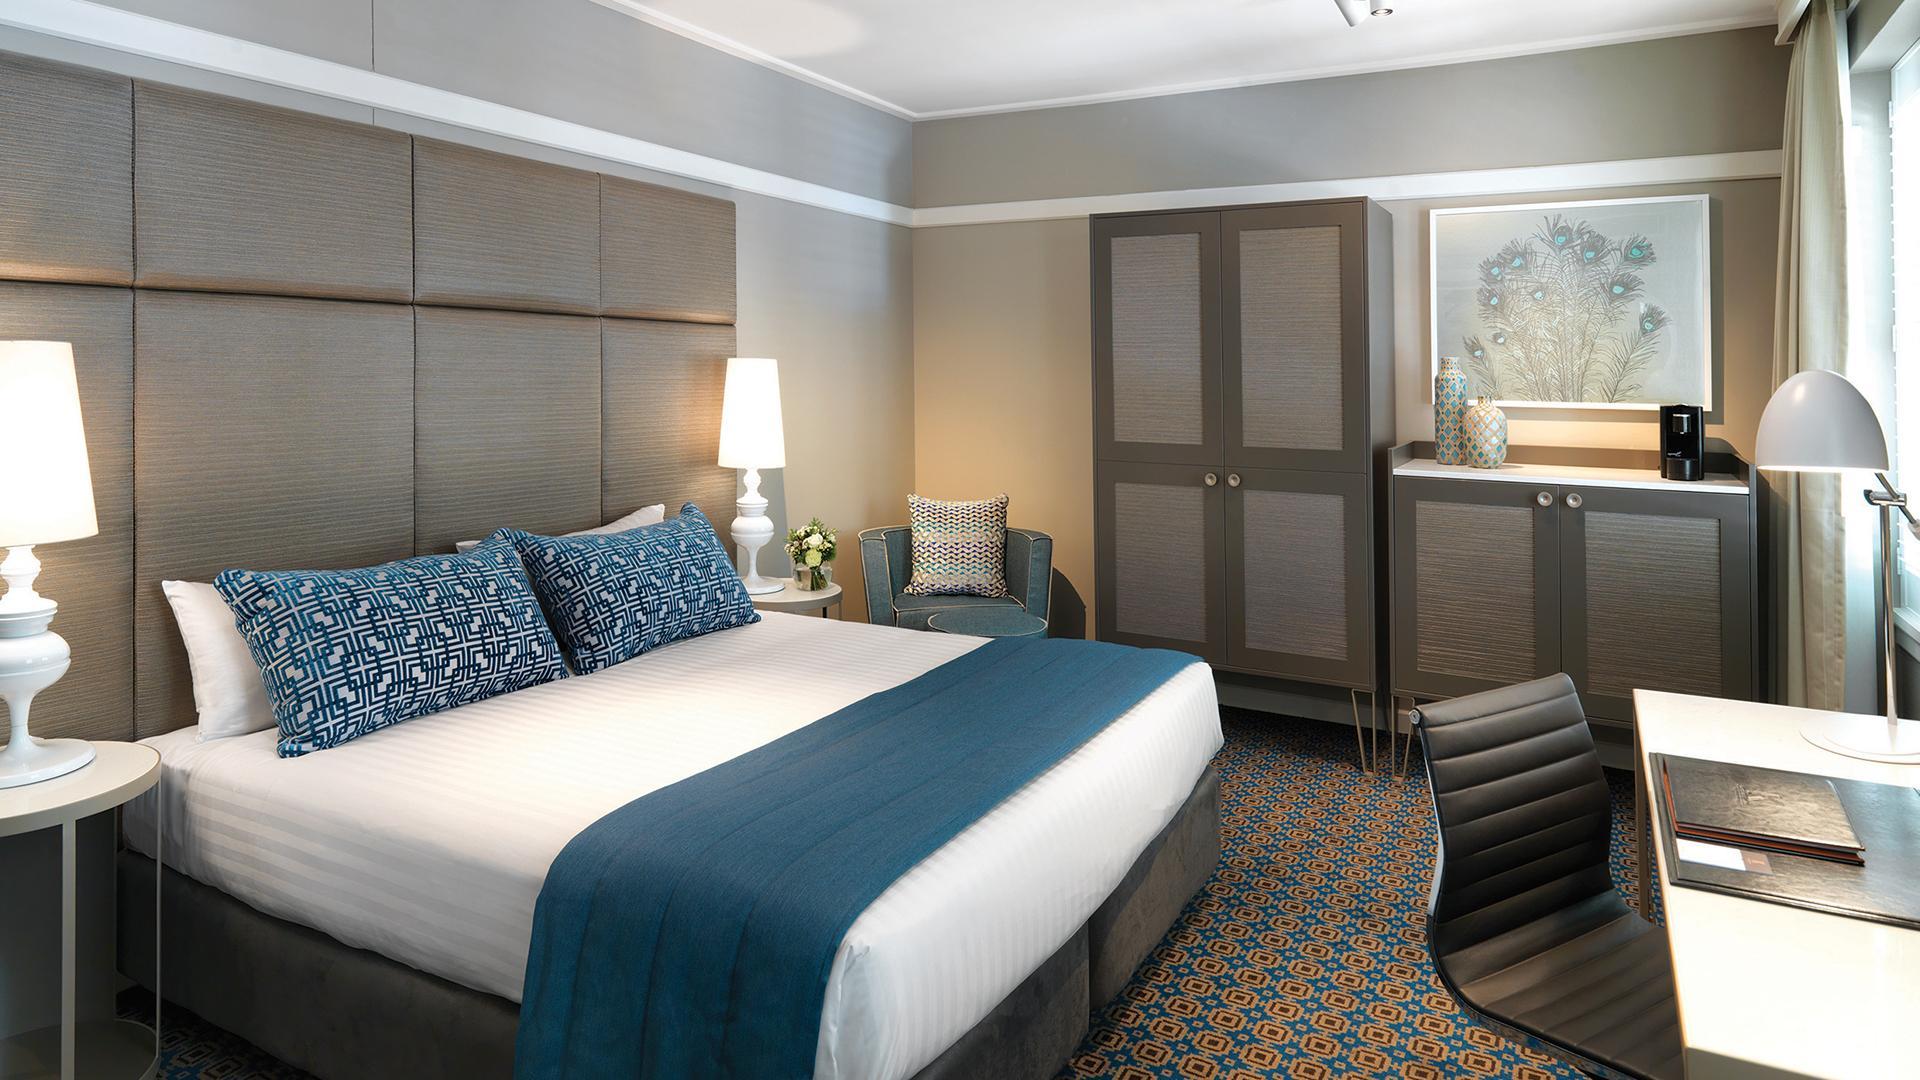 Classic Room image 1 at Hotel Kurrajong Canberra by null, Australian Capital Territory, Australia